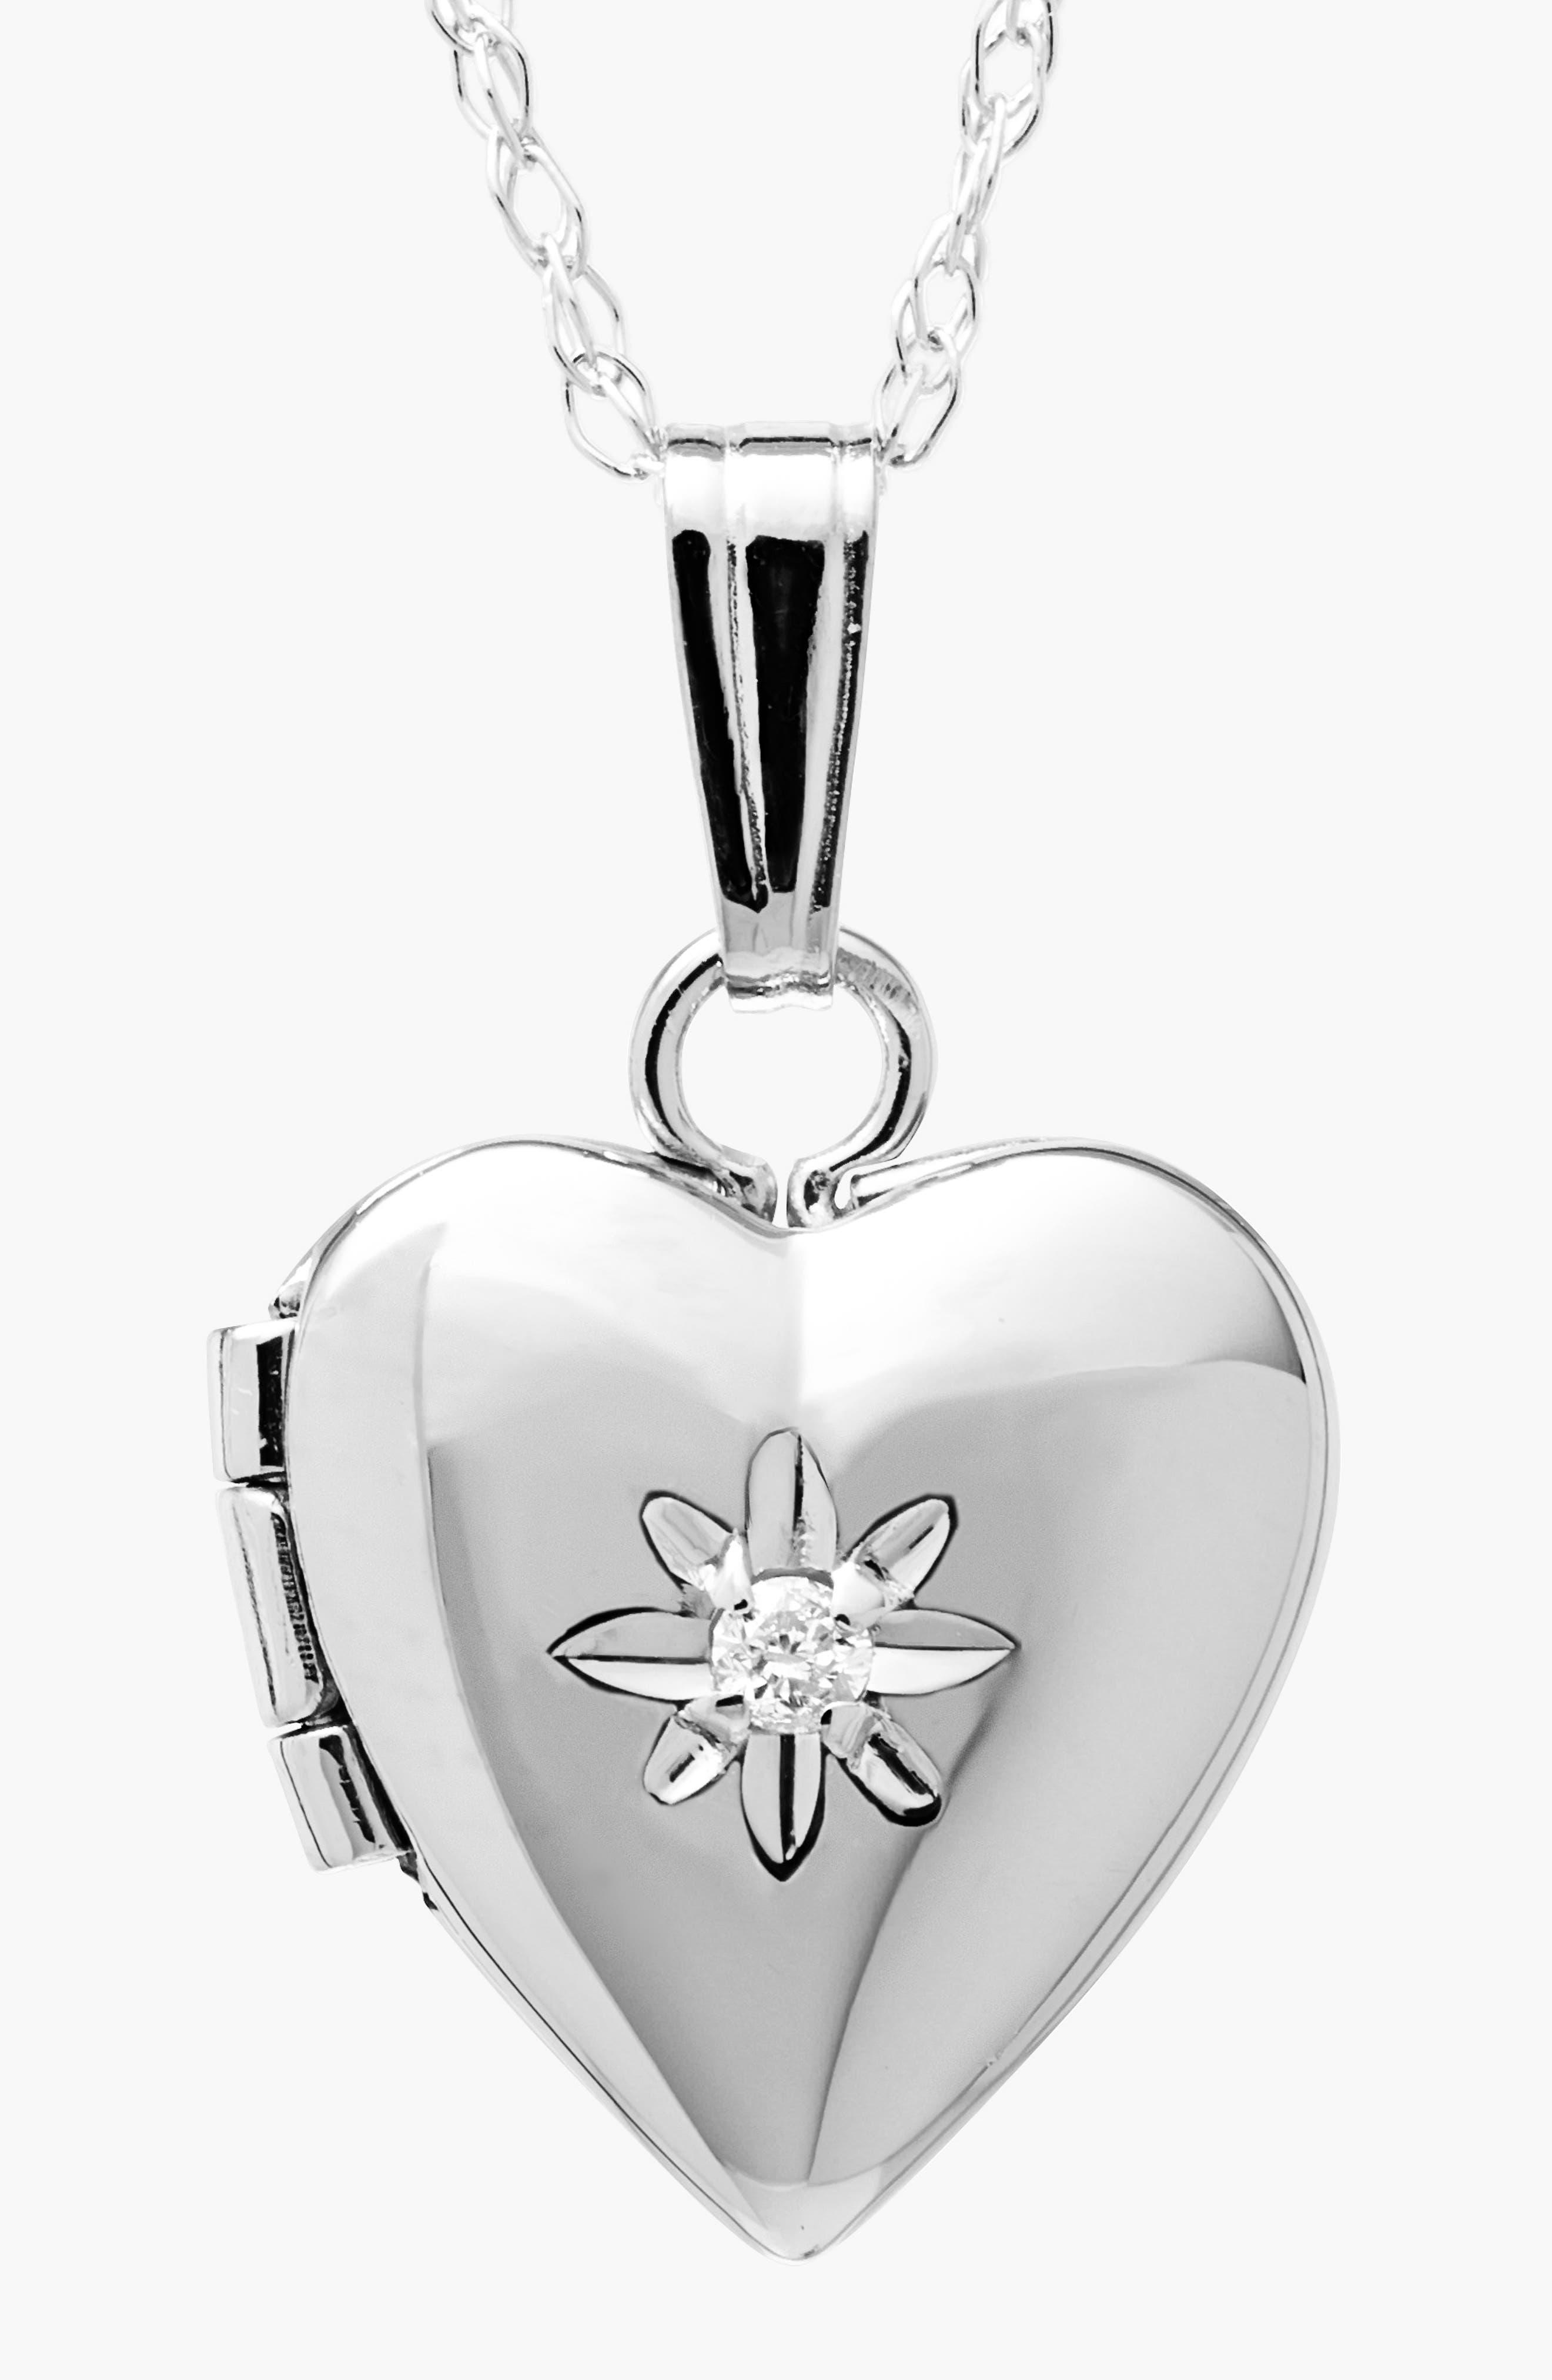 14k White Gold Heart Locket Necklace,                             Alternate thumbnail 2, color,                             040